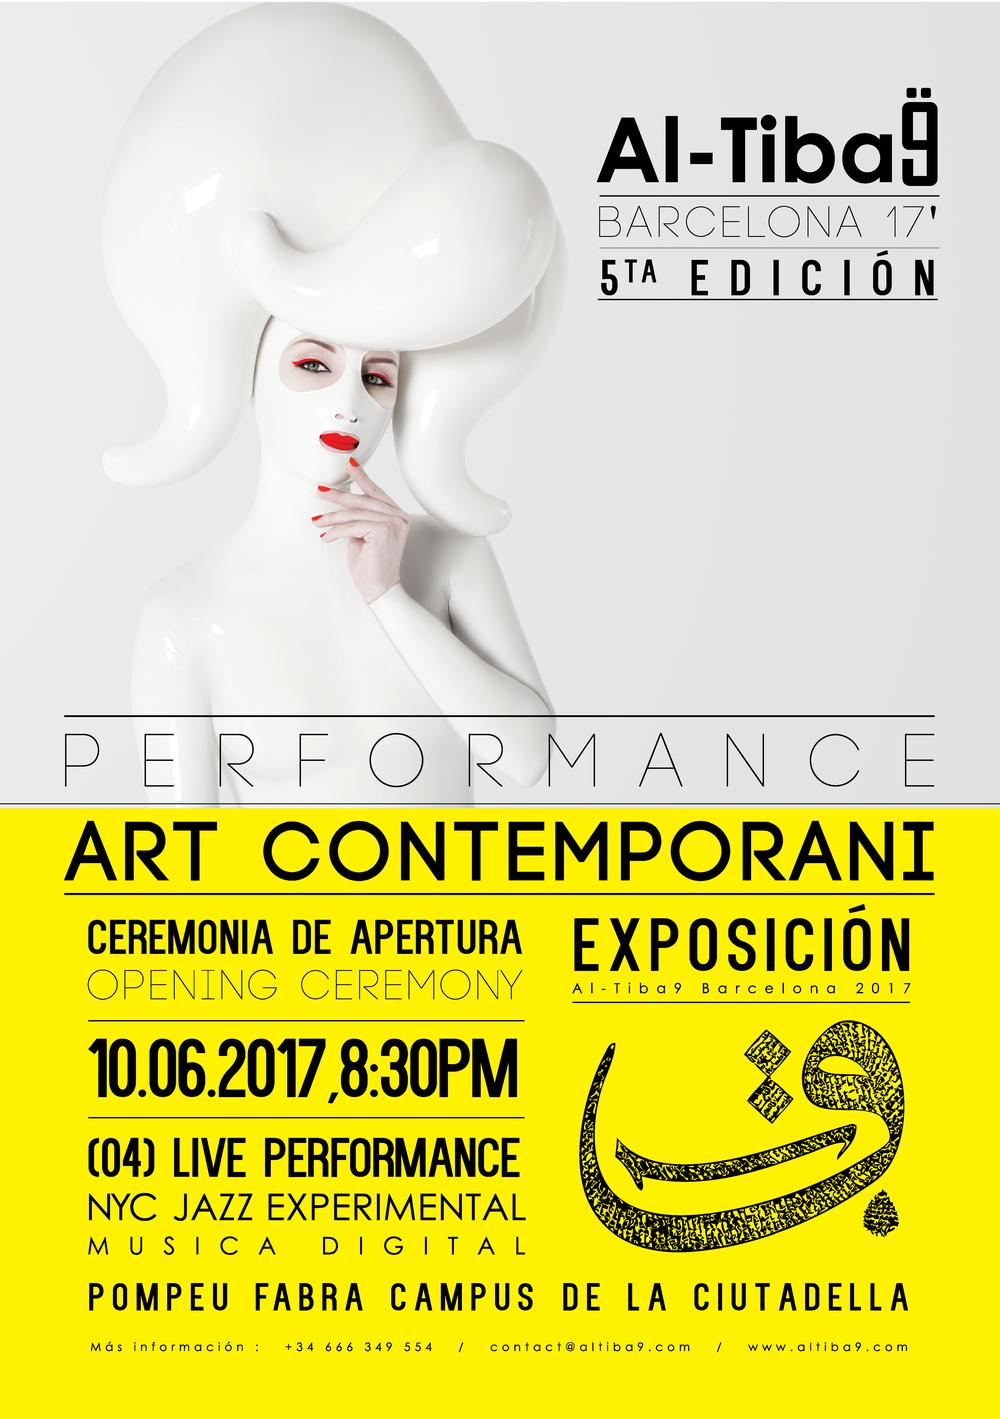 Al-Tiba9_5th_Edition_Barcelona_2017_Contemporary_Art_Performance_Sasha_Frolova